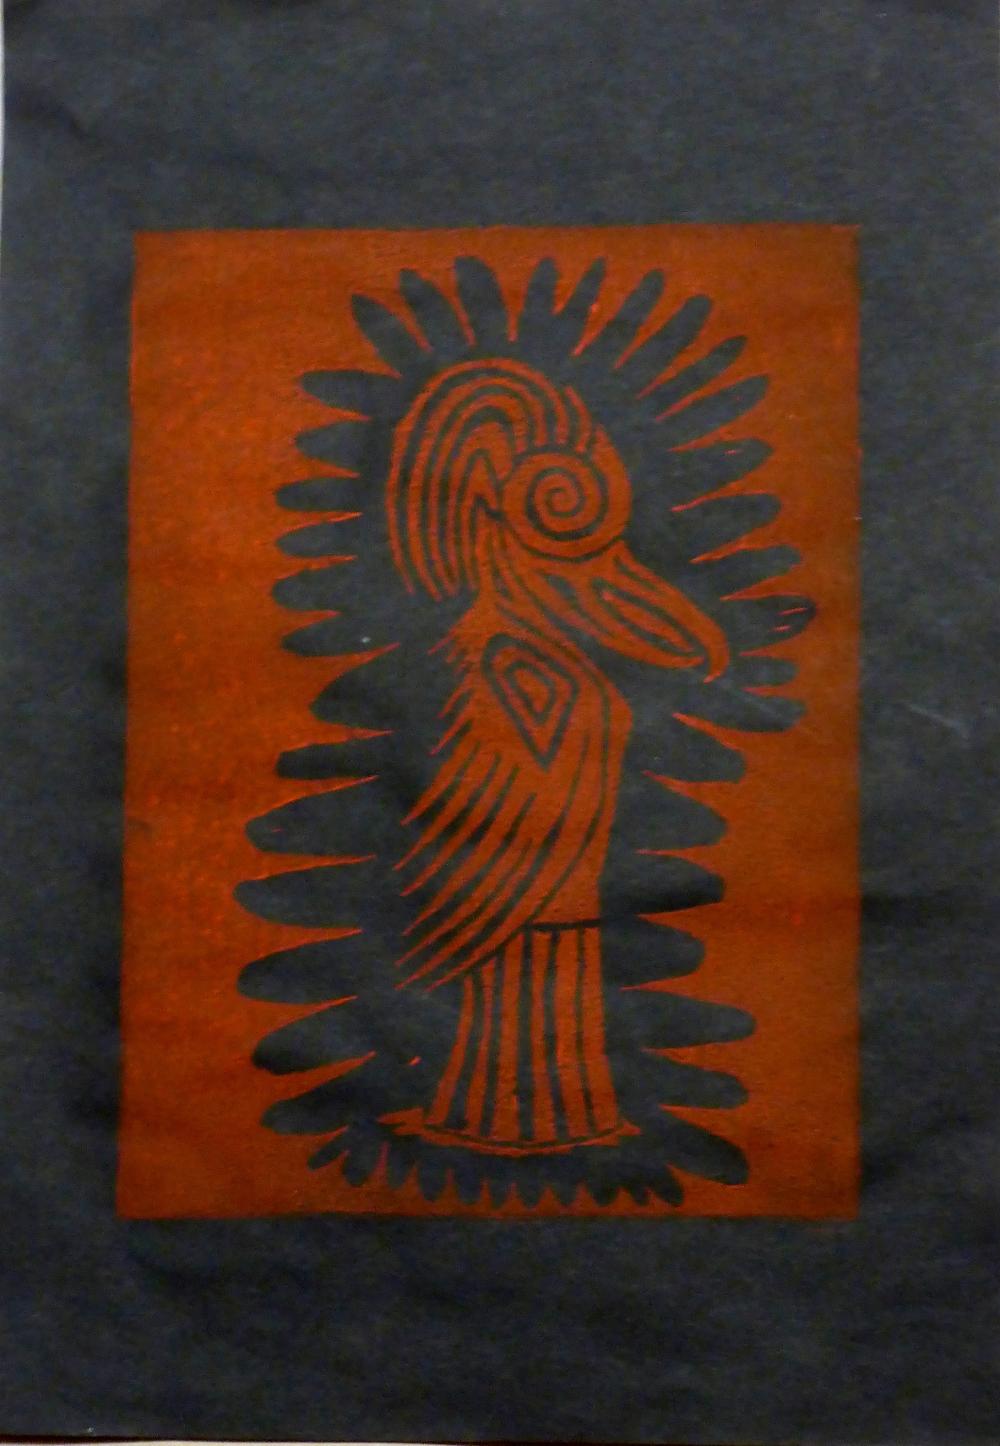 """Eris IV"", 2018, linocut on paper, 21 x 30 cm"